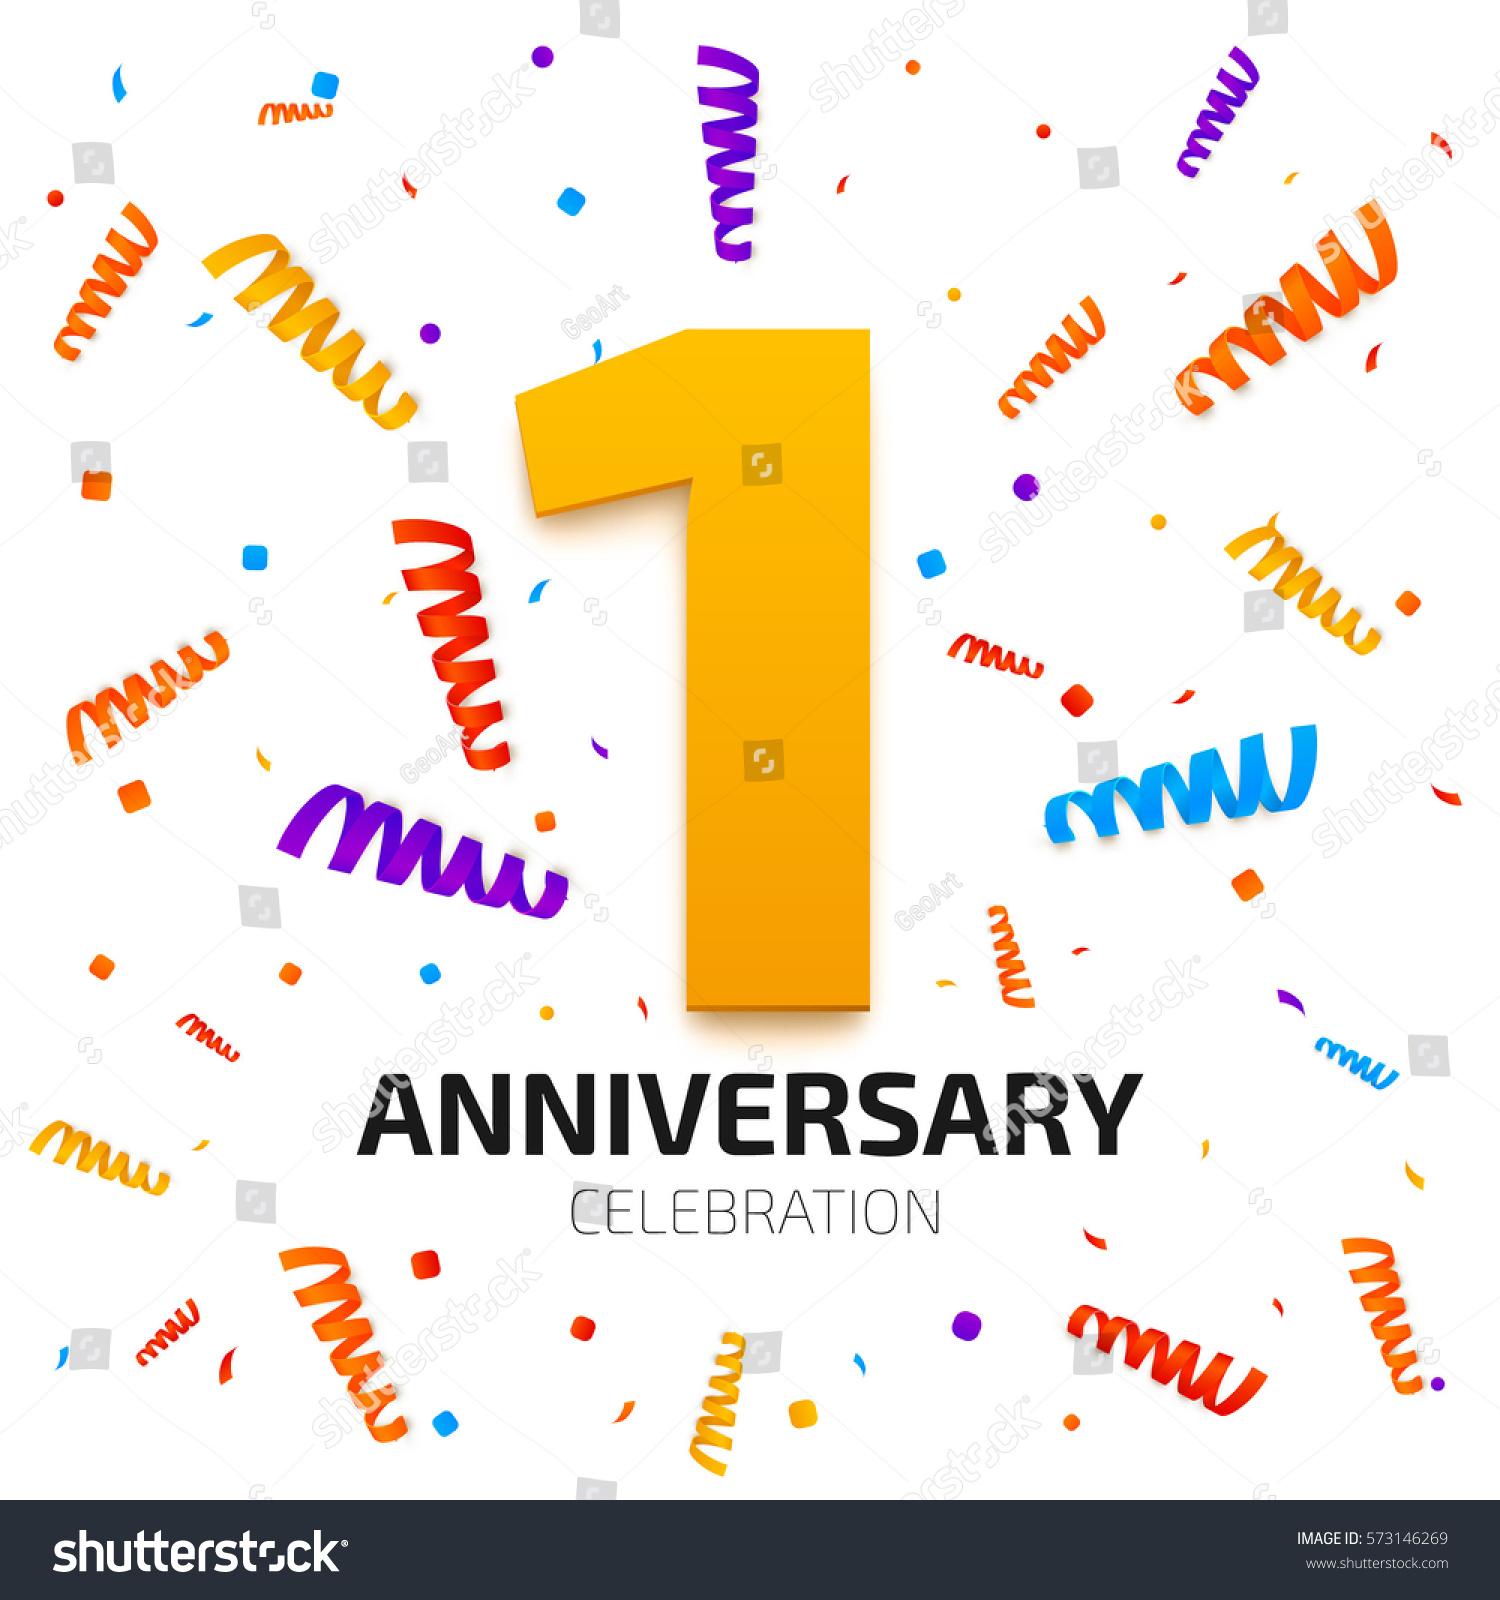 One year anniversary banner stock vector